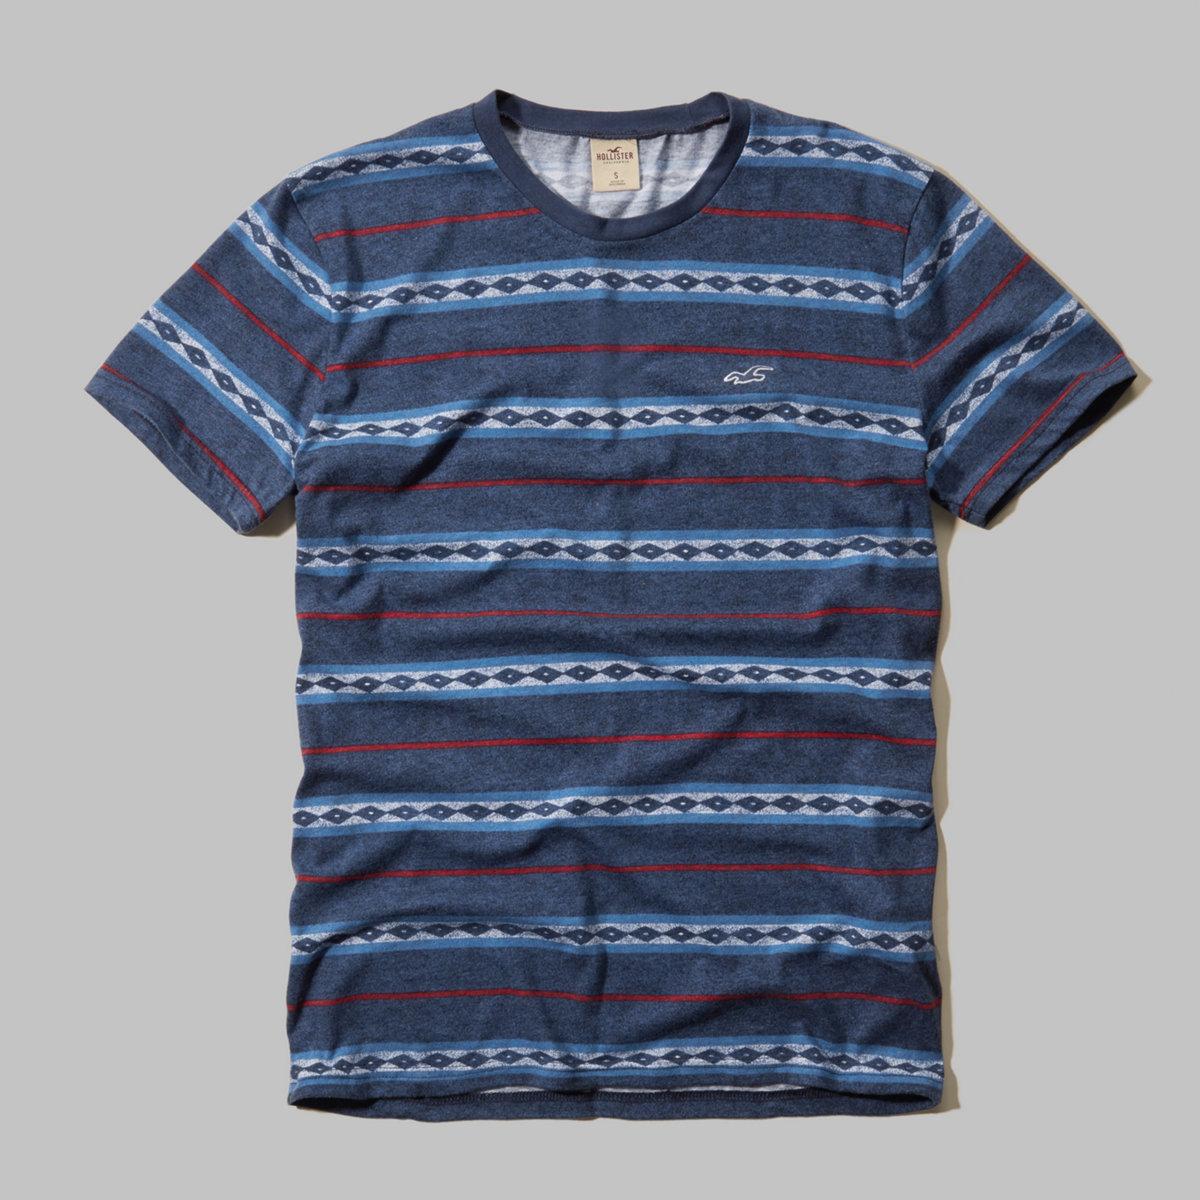 Summerland Aztec Print T-Shirt